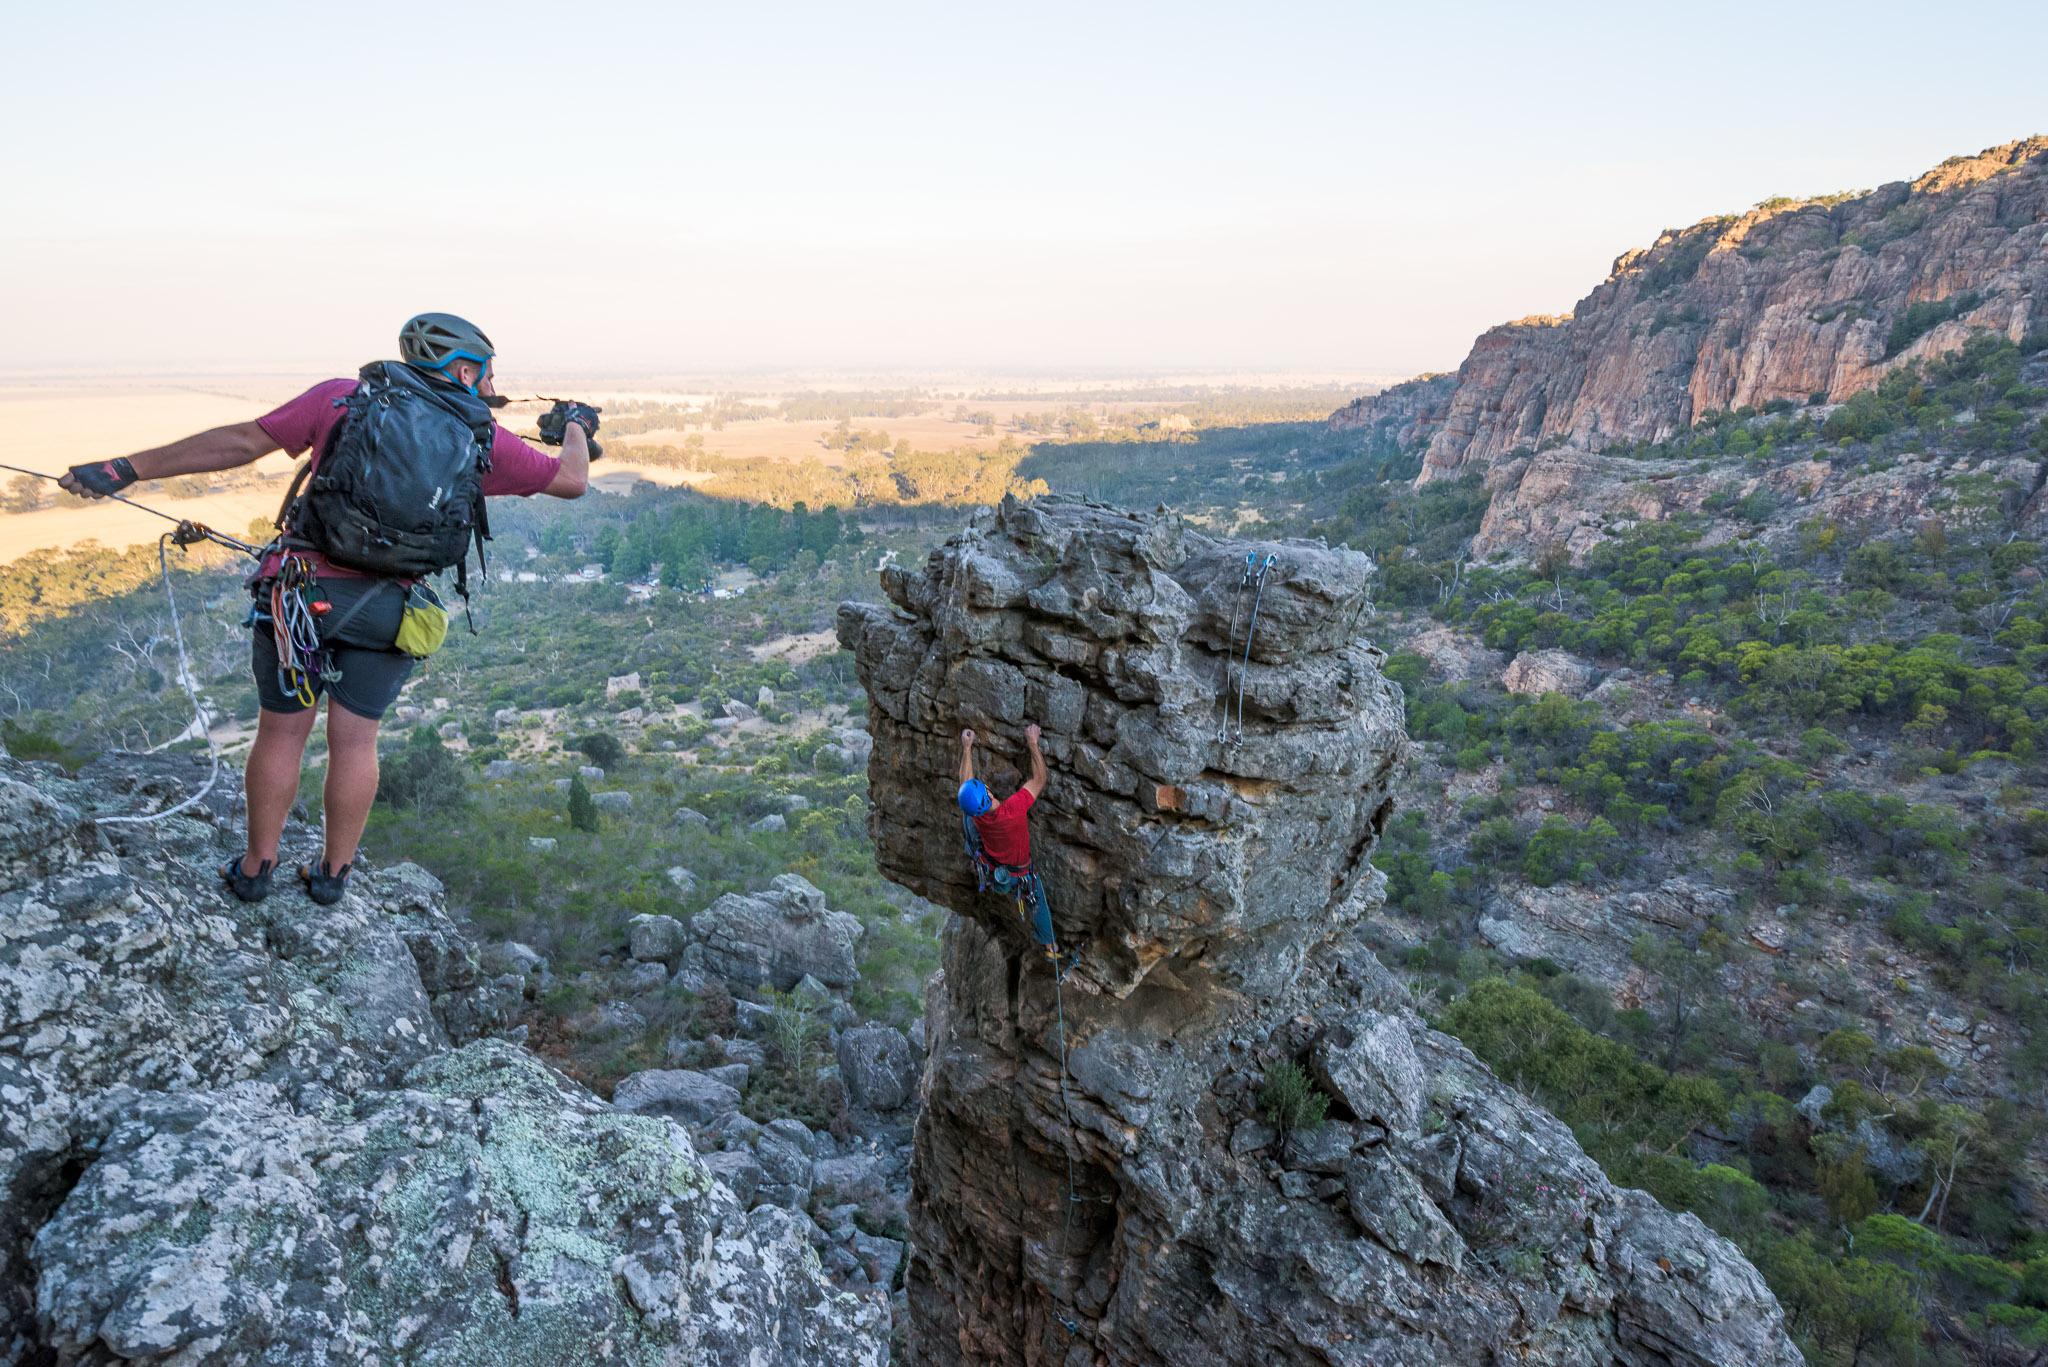 Jake Anderson photographs Rodrigo de Paiva climbing Pestilence (19), Arapiles VIC.